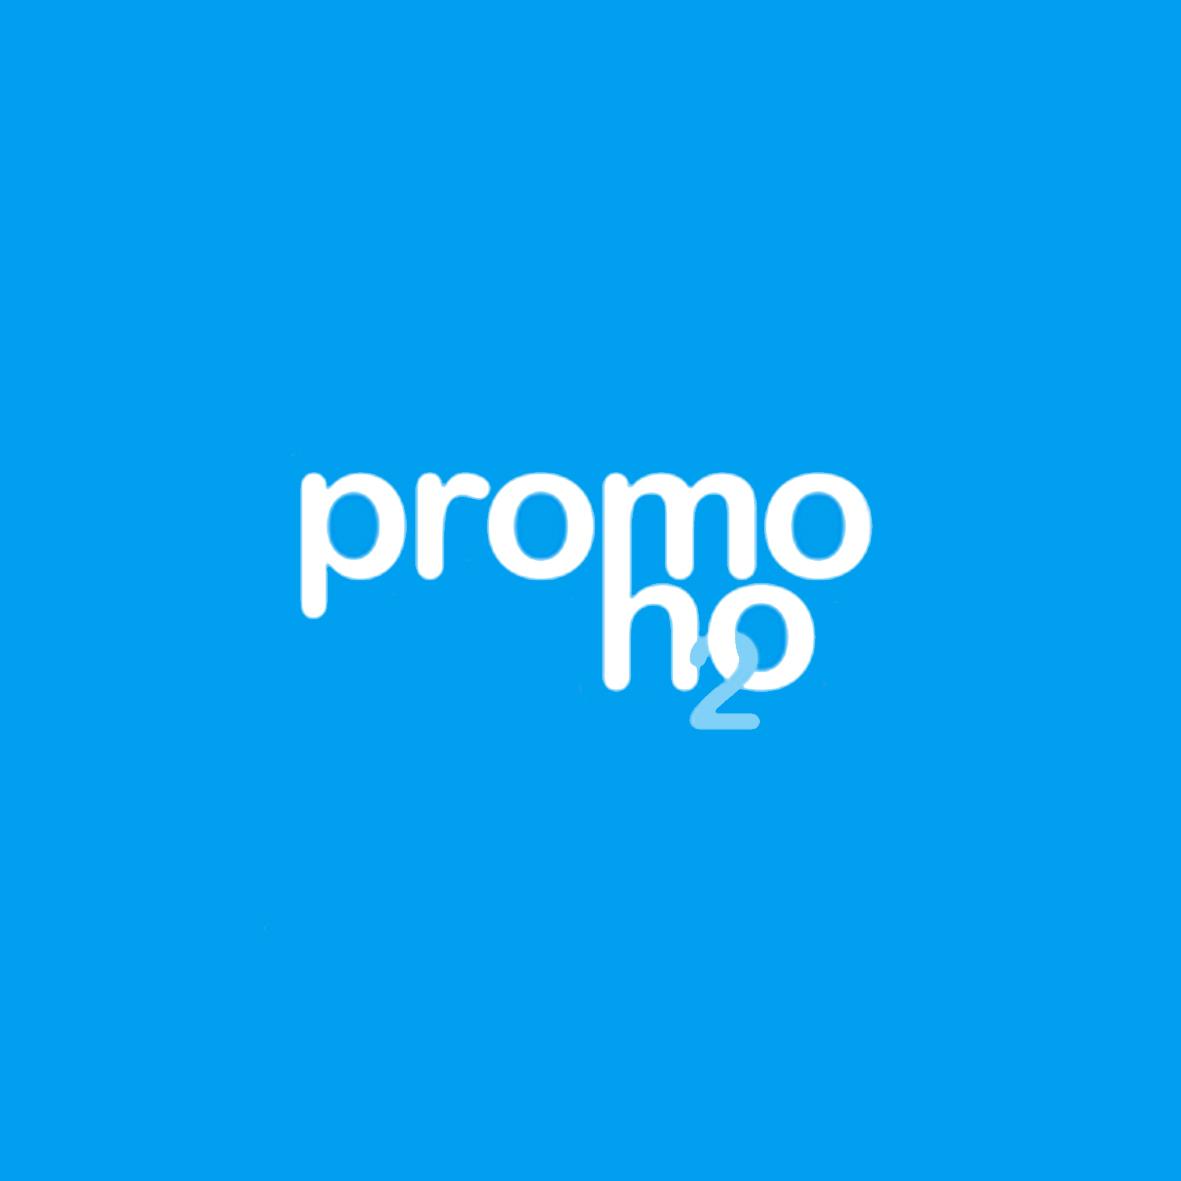 promoh20.jpg